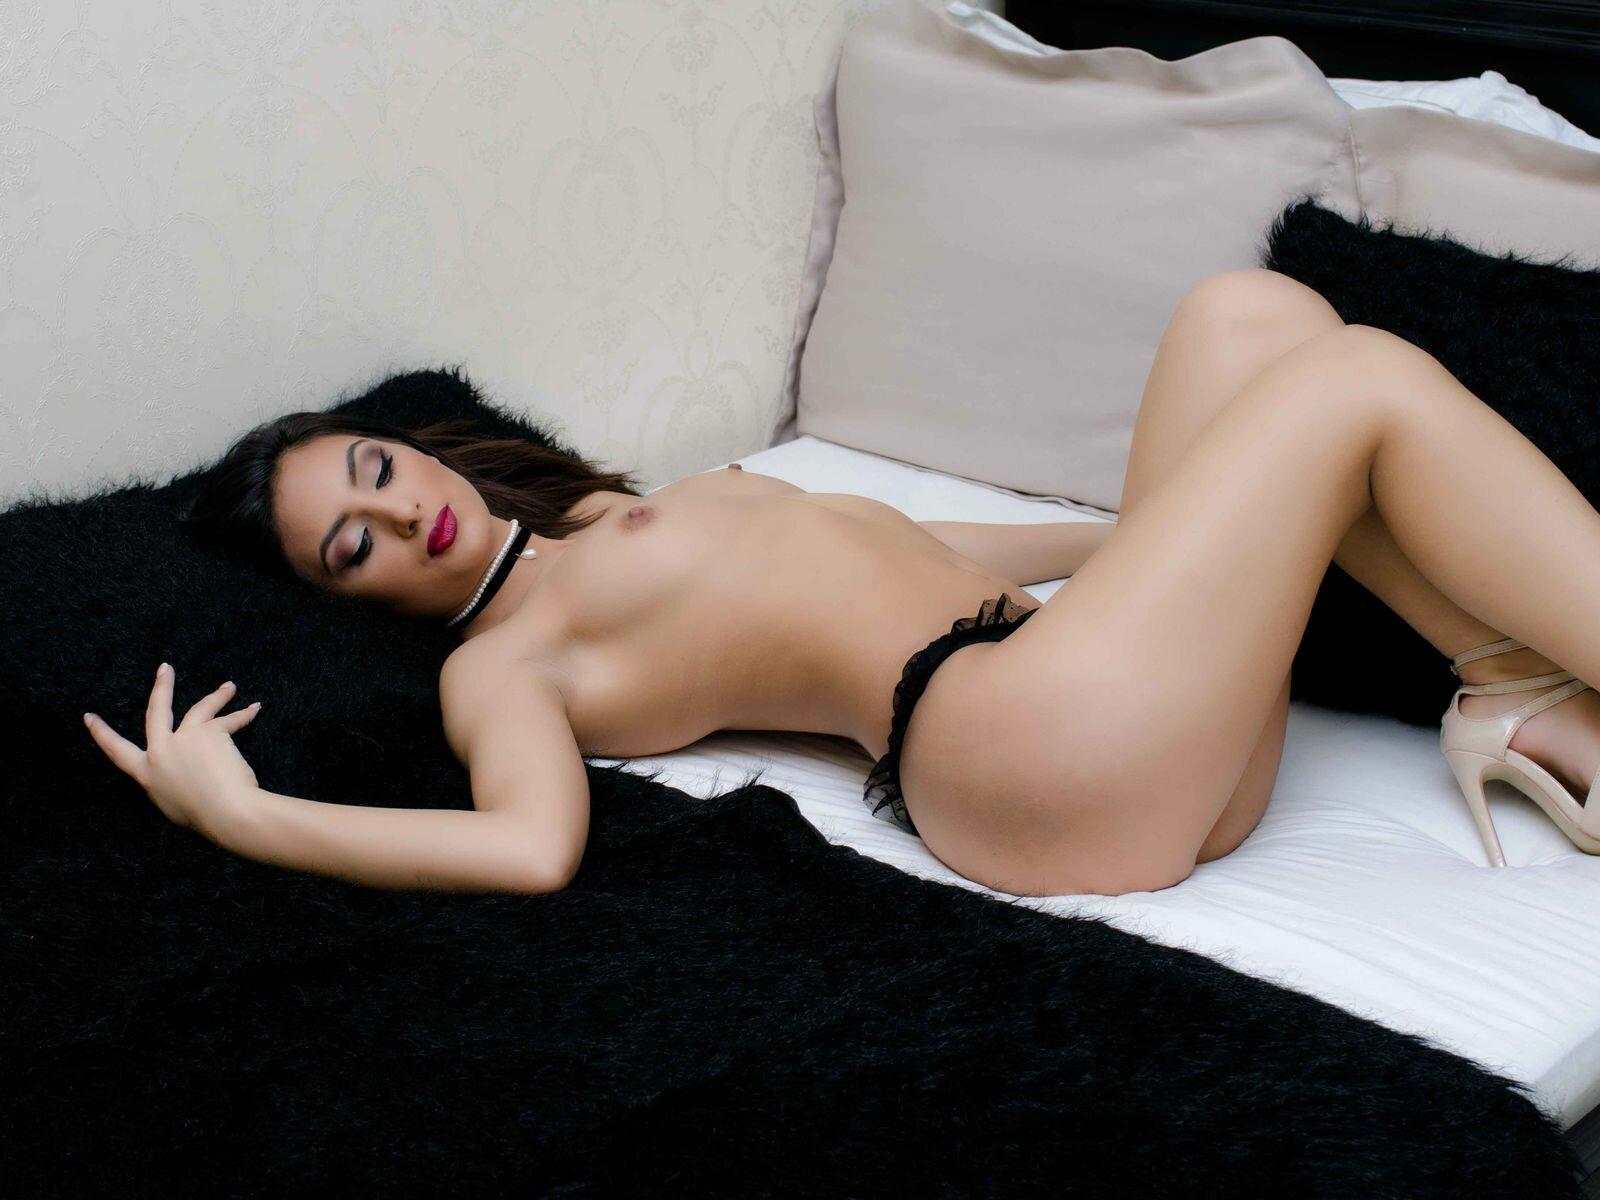 Itsvivihellyeah new sex photo